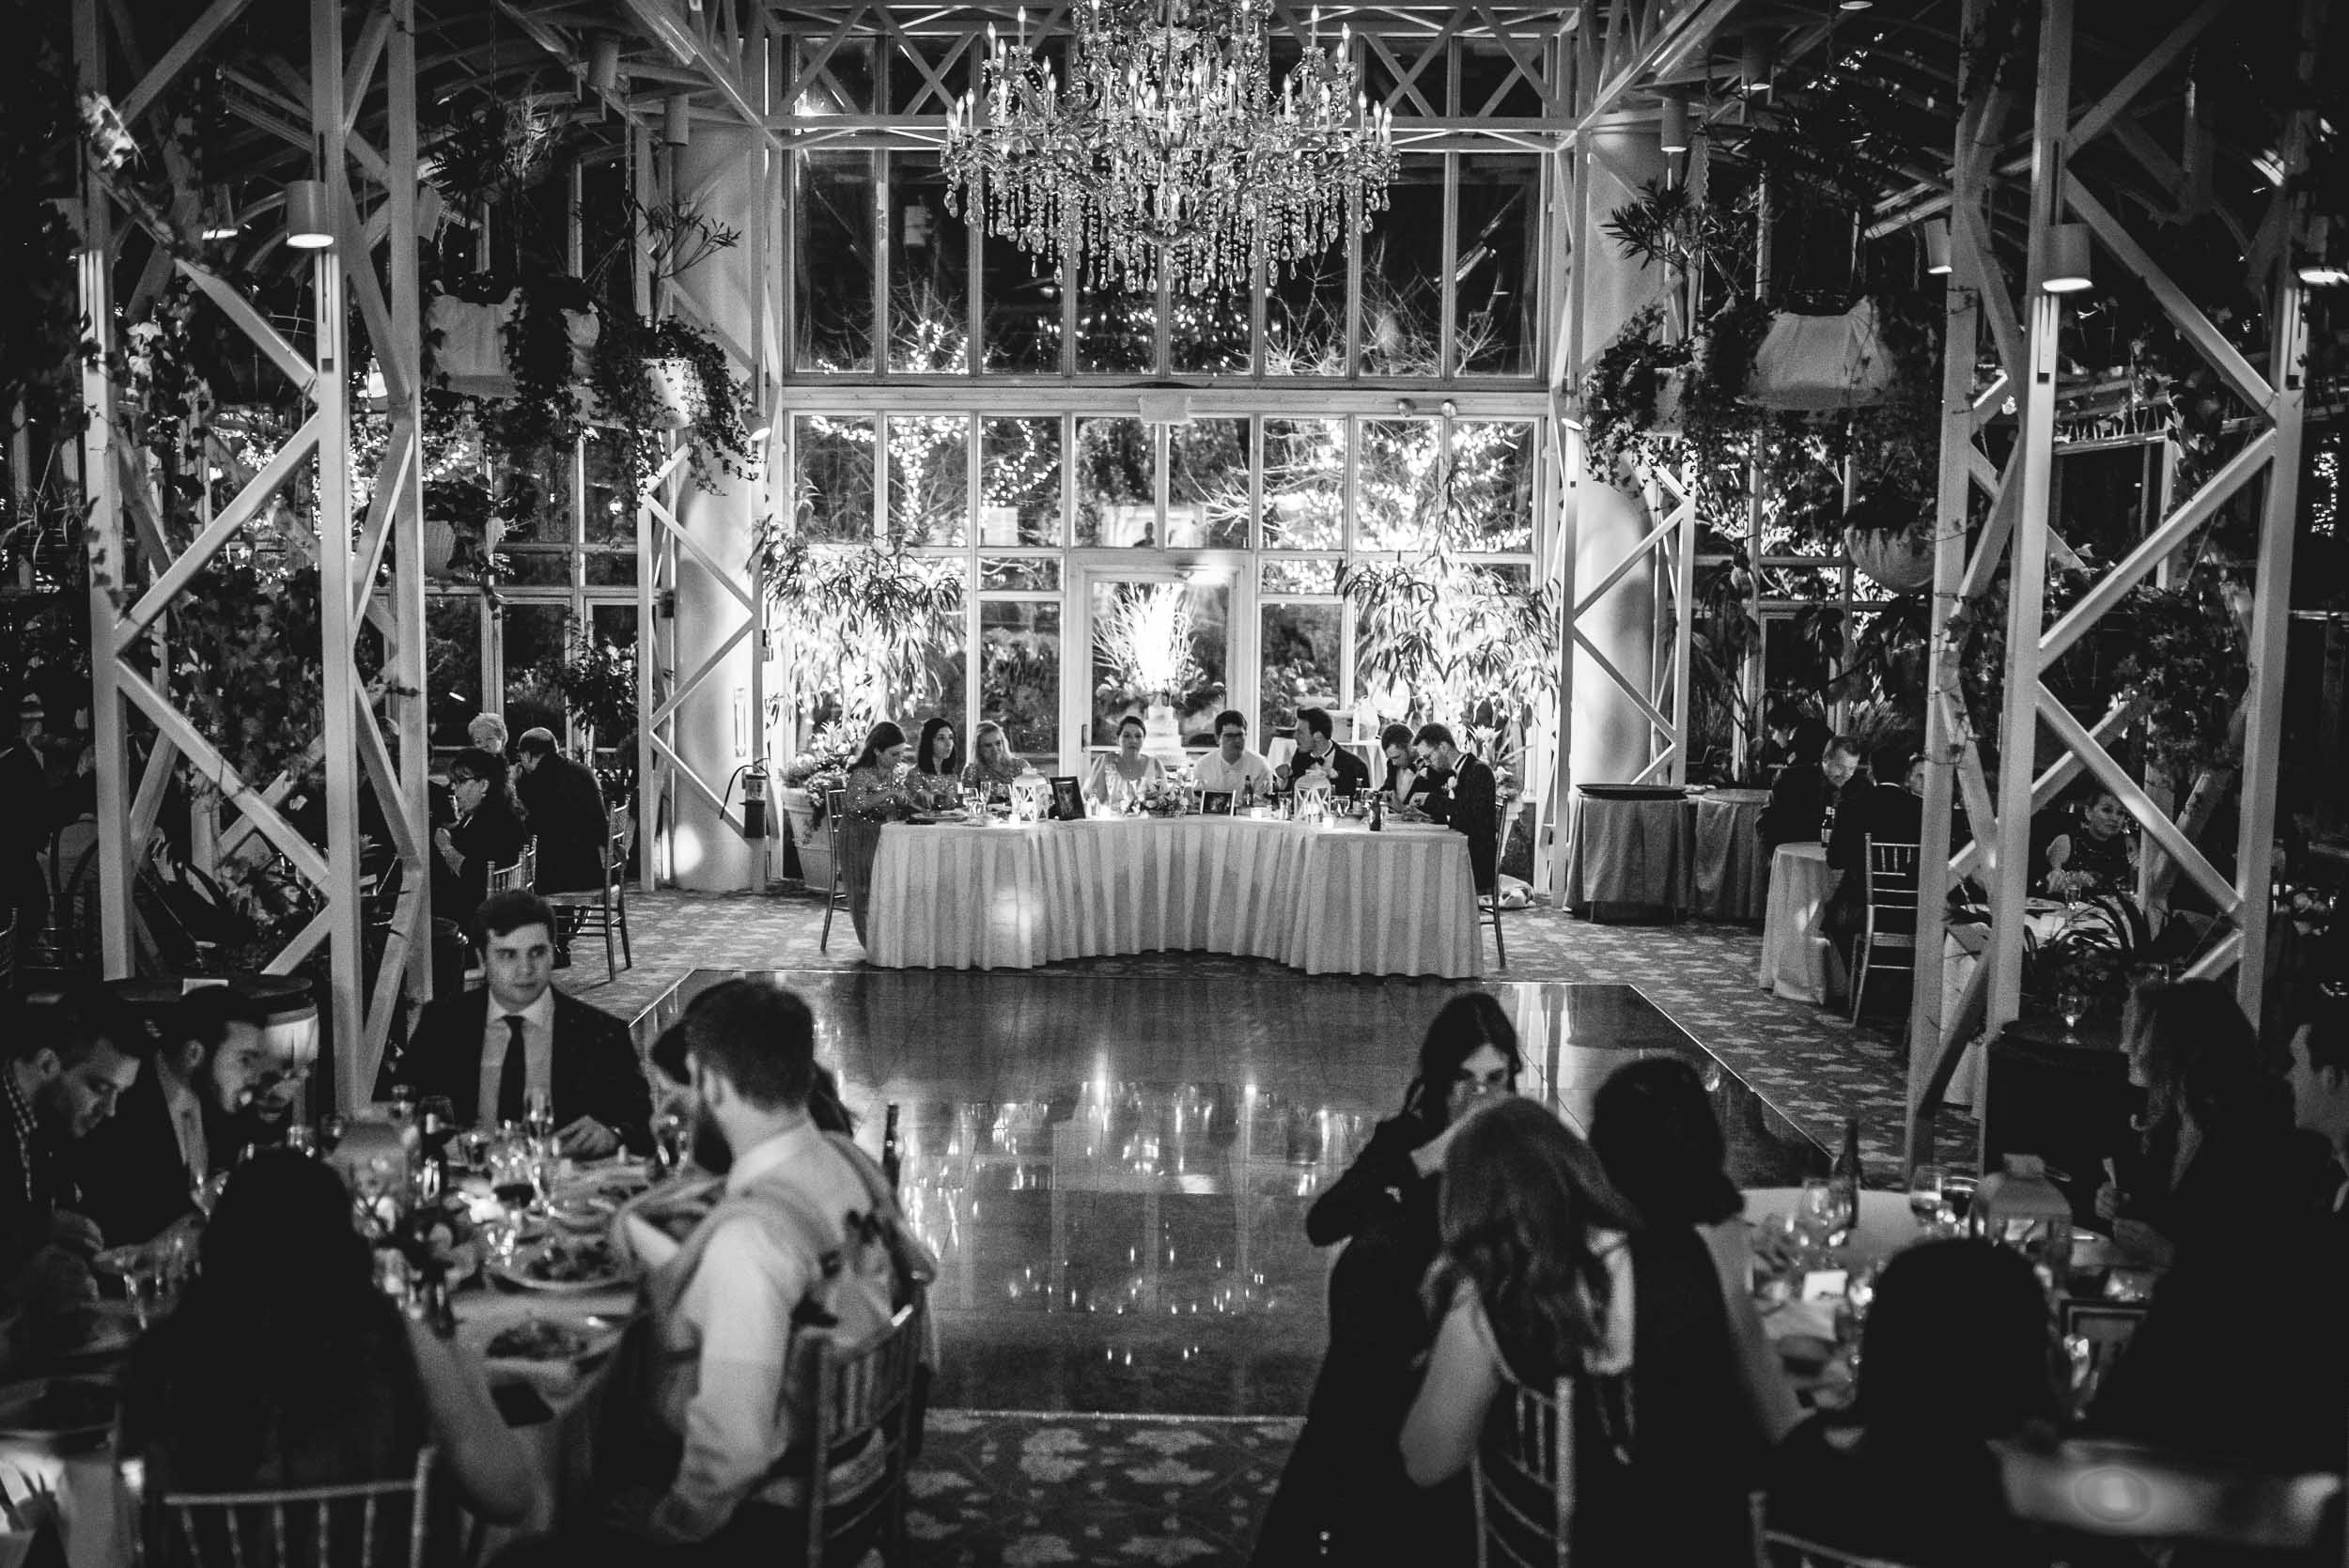 KatieandMathias_Morristown_NewJersey_Wedding_Church_Assumption_Madison_Hotel(55of65).jpg